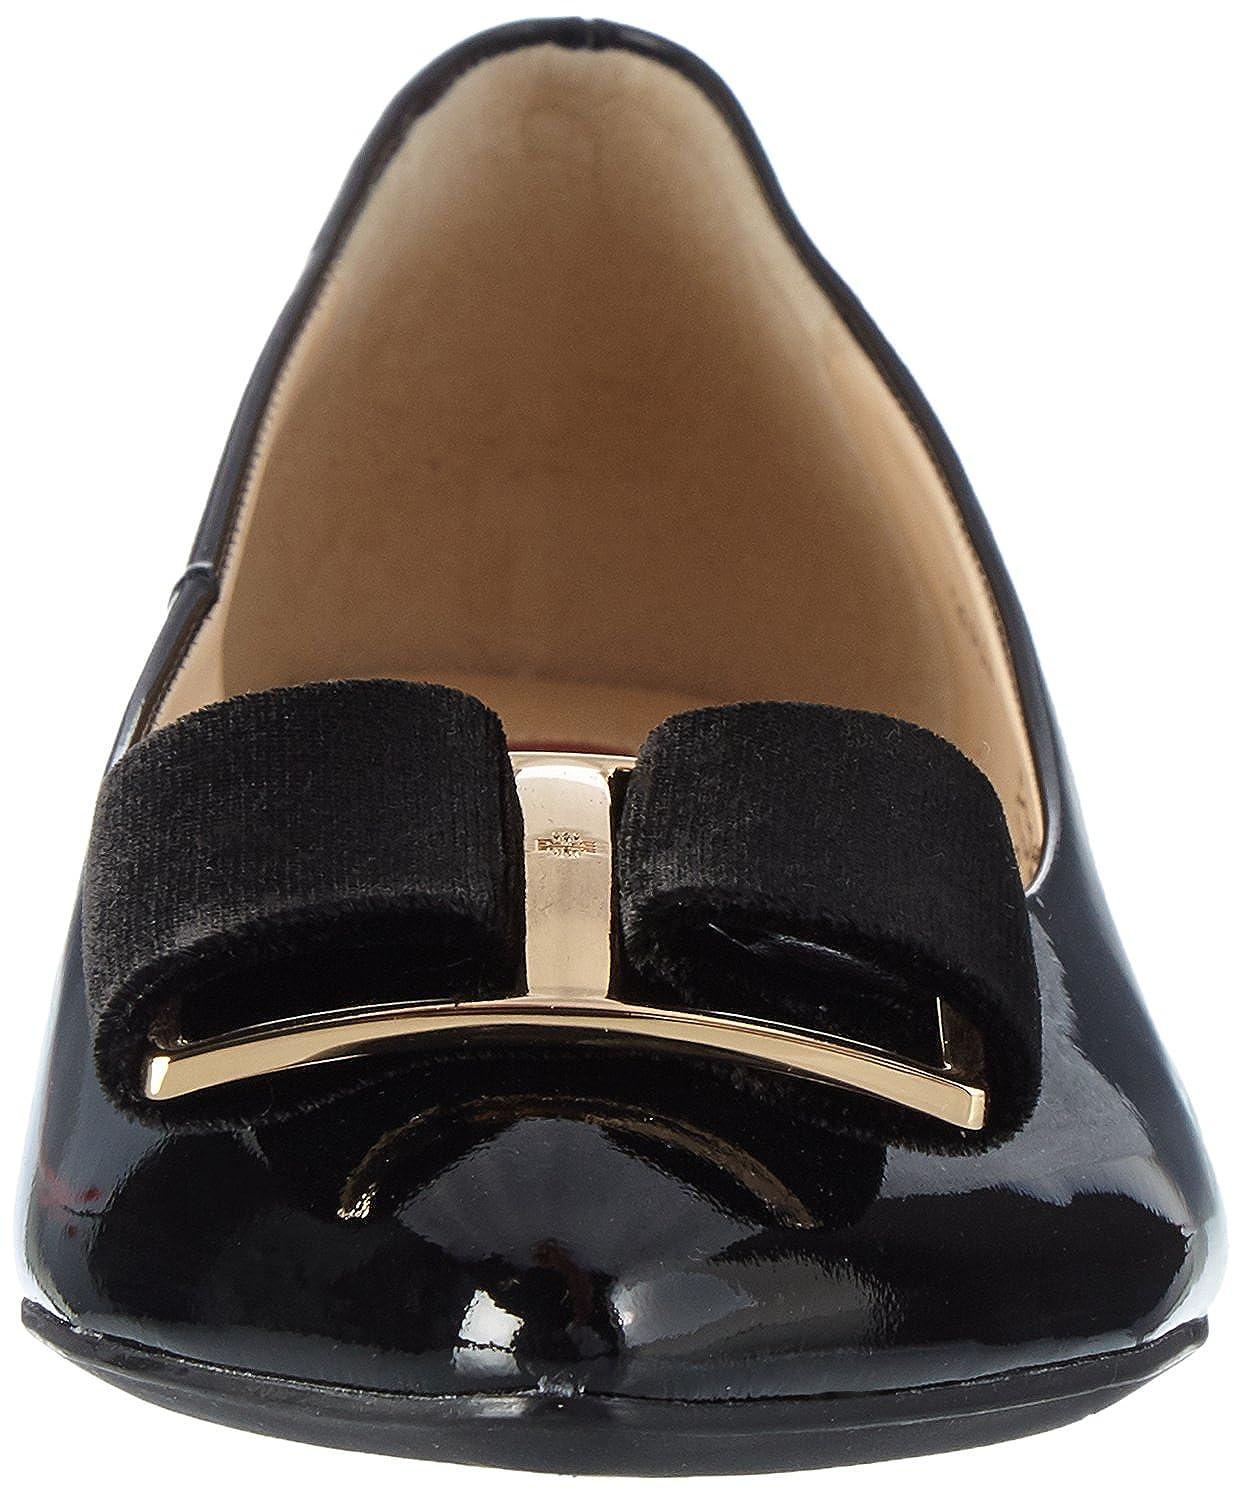 Högl 4-10 2084 0100, Zapatos de Tacón para Mujer Mujer Mujer e26745